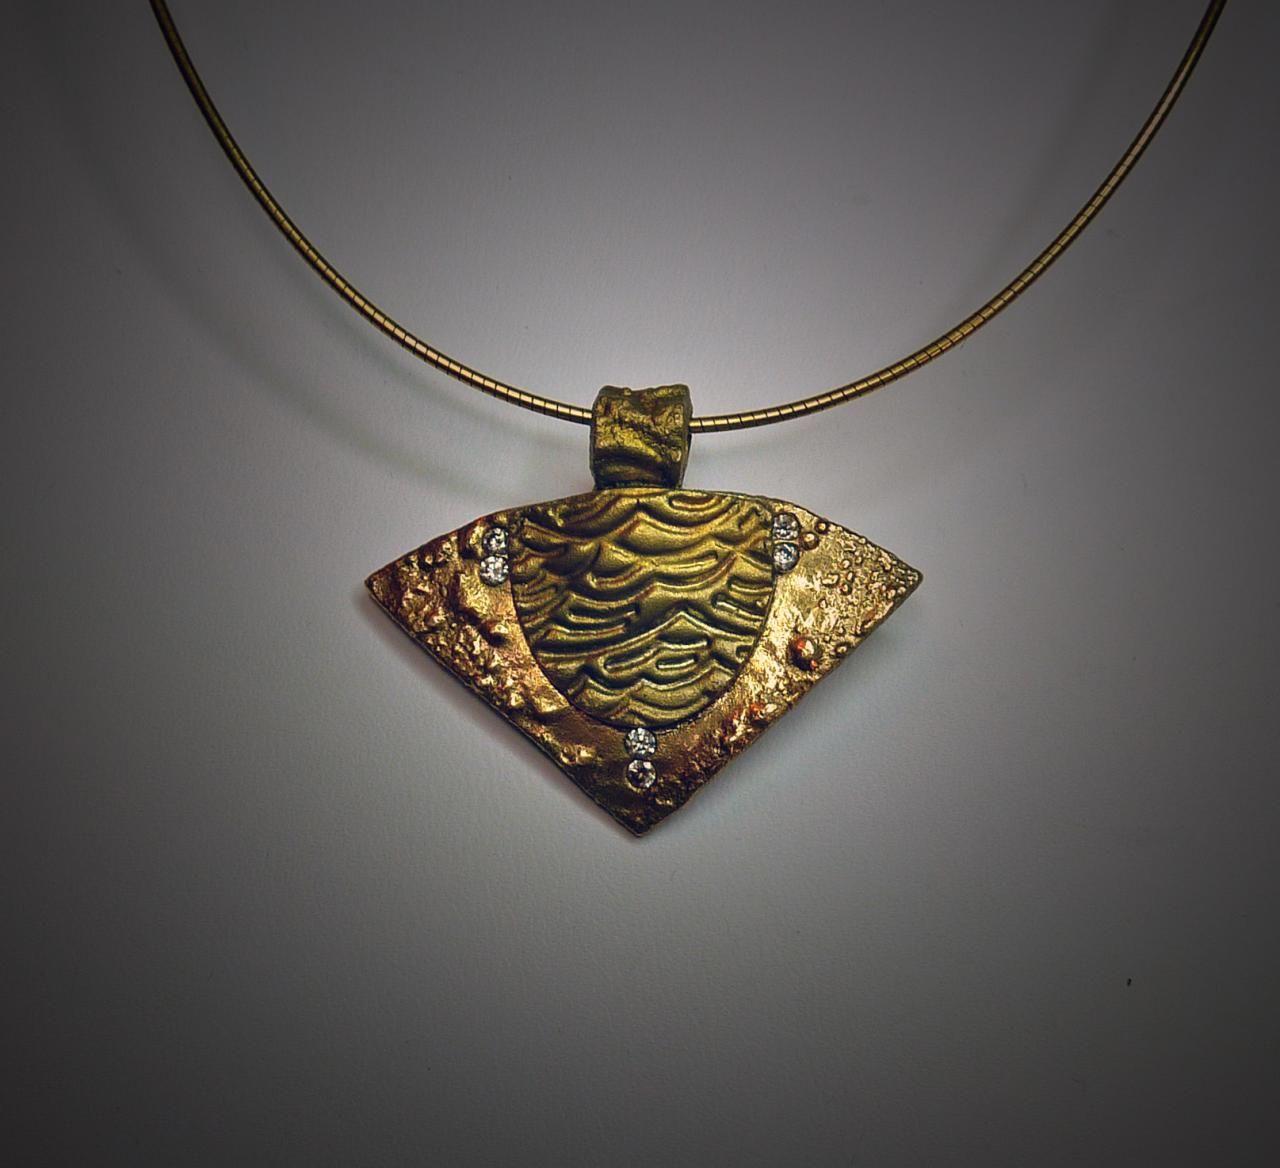 Divine ornaments gallery metal clay jewelry precious